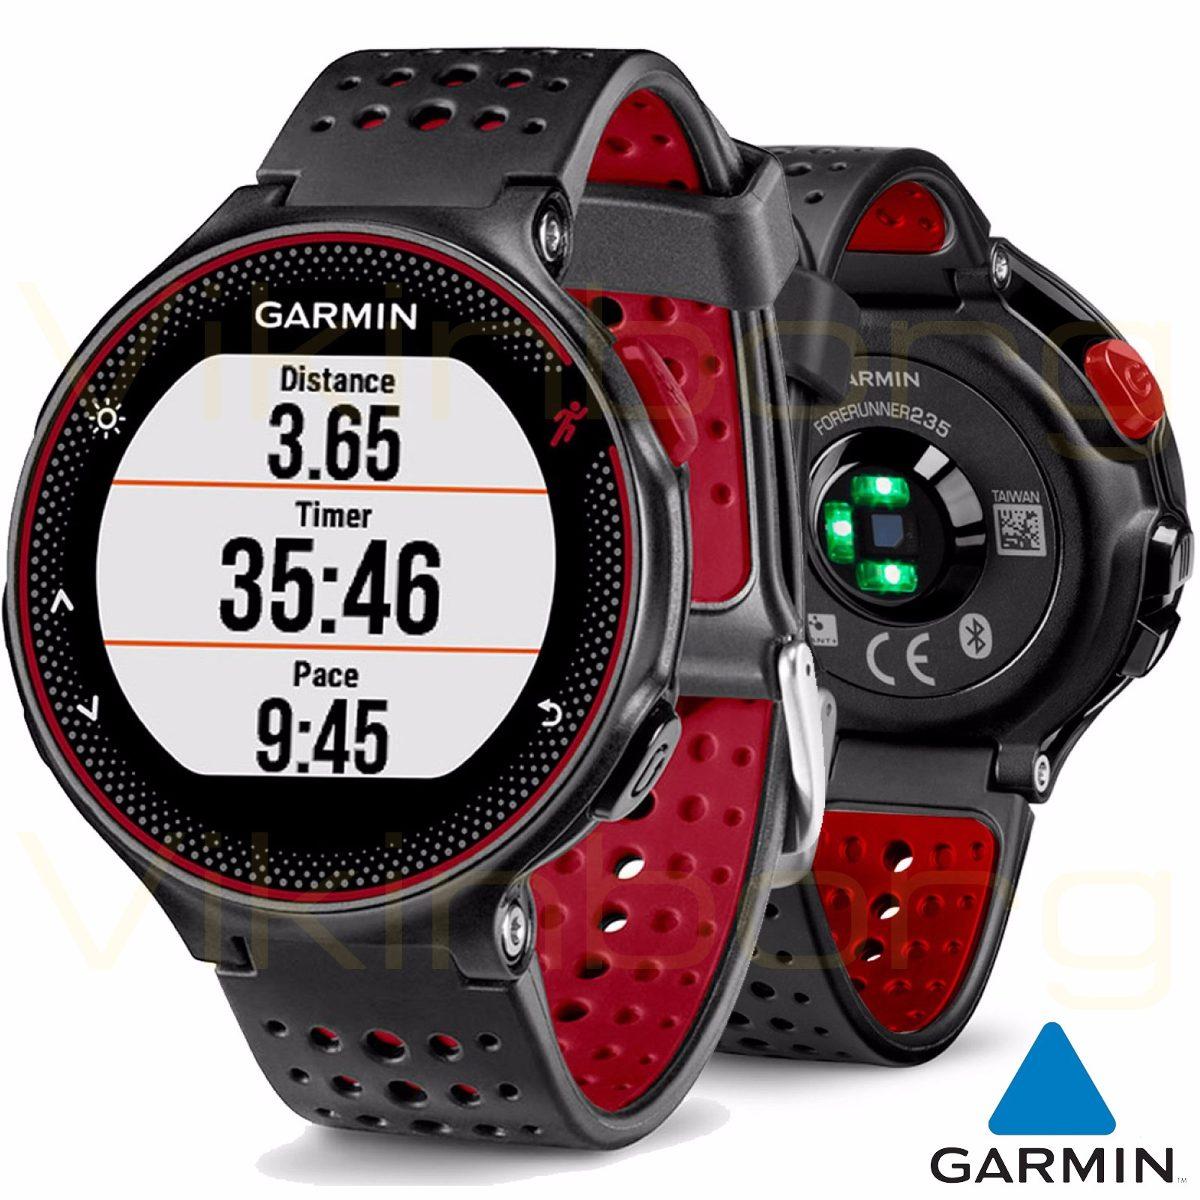 3ac50a150b garmin reloj forerunner 235 hrm cardio running marsala red. Cargando zoom.